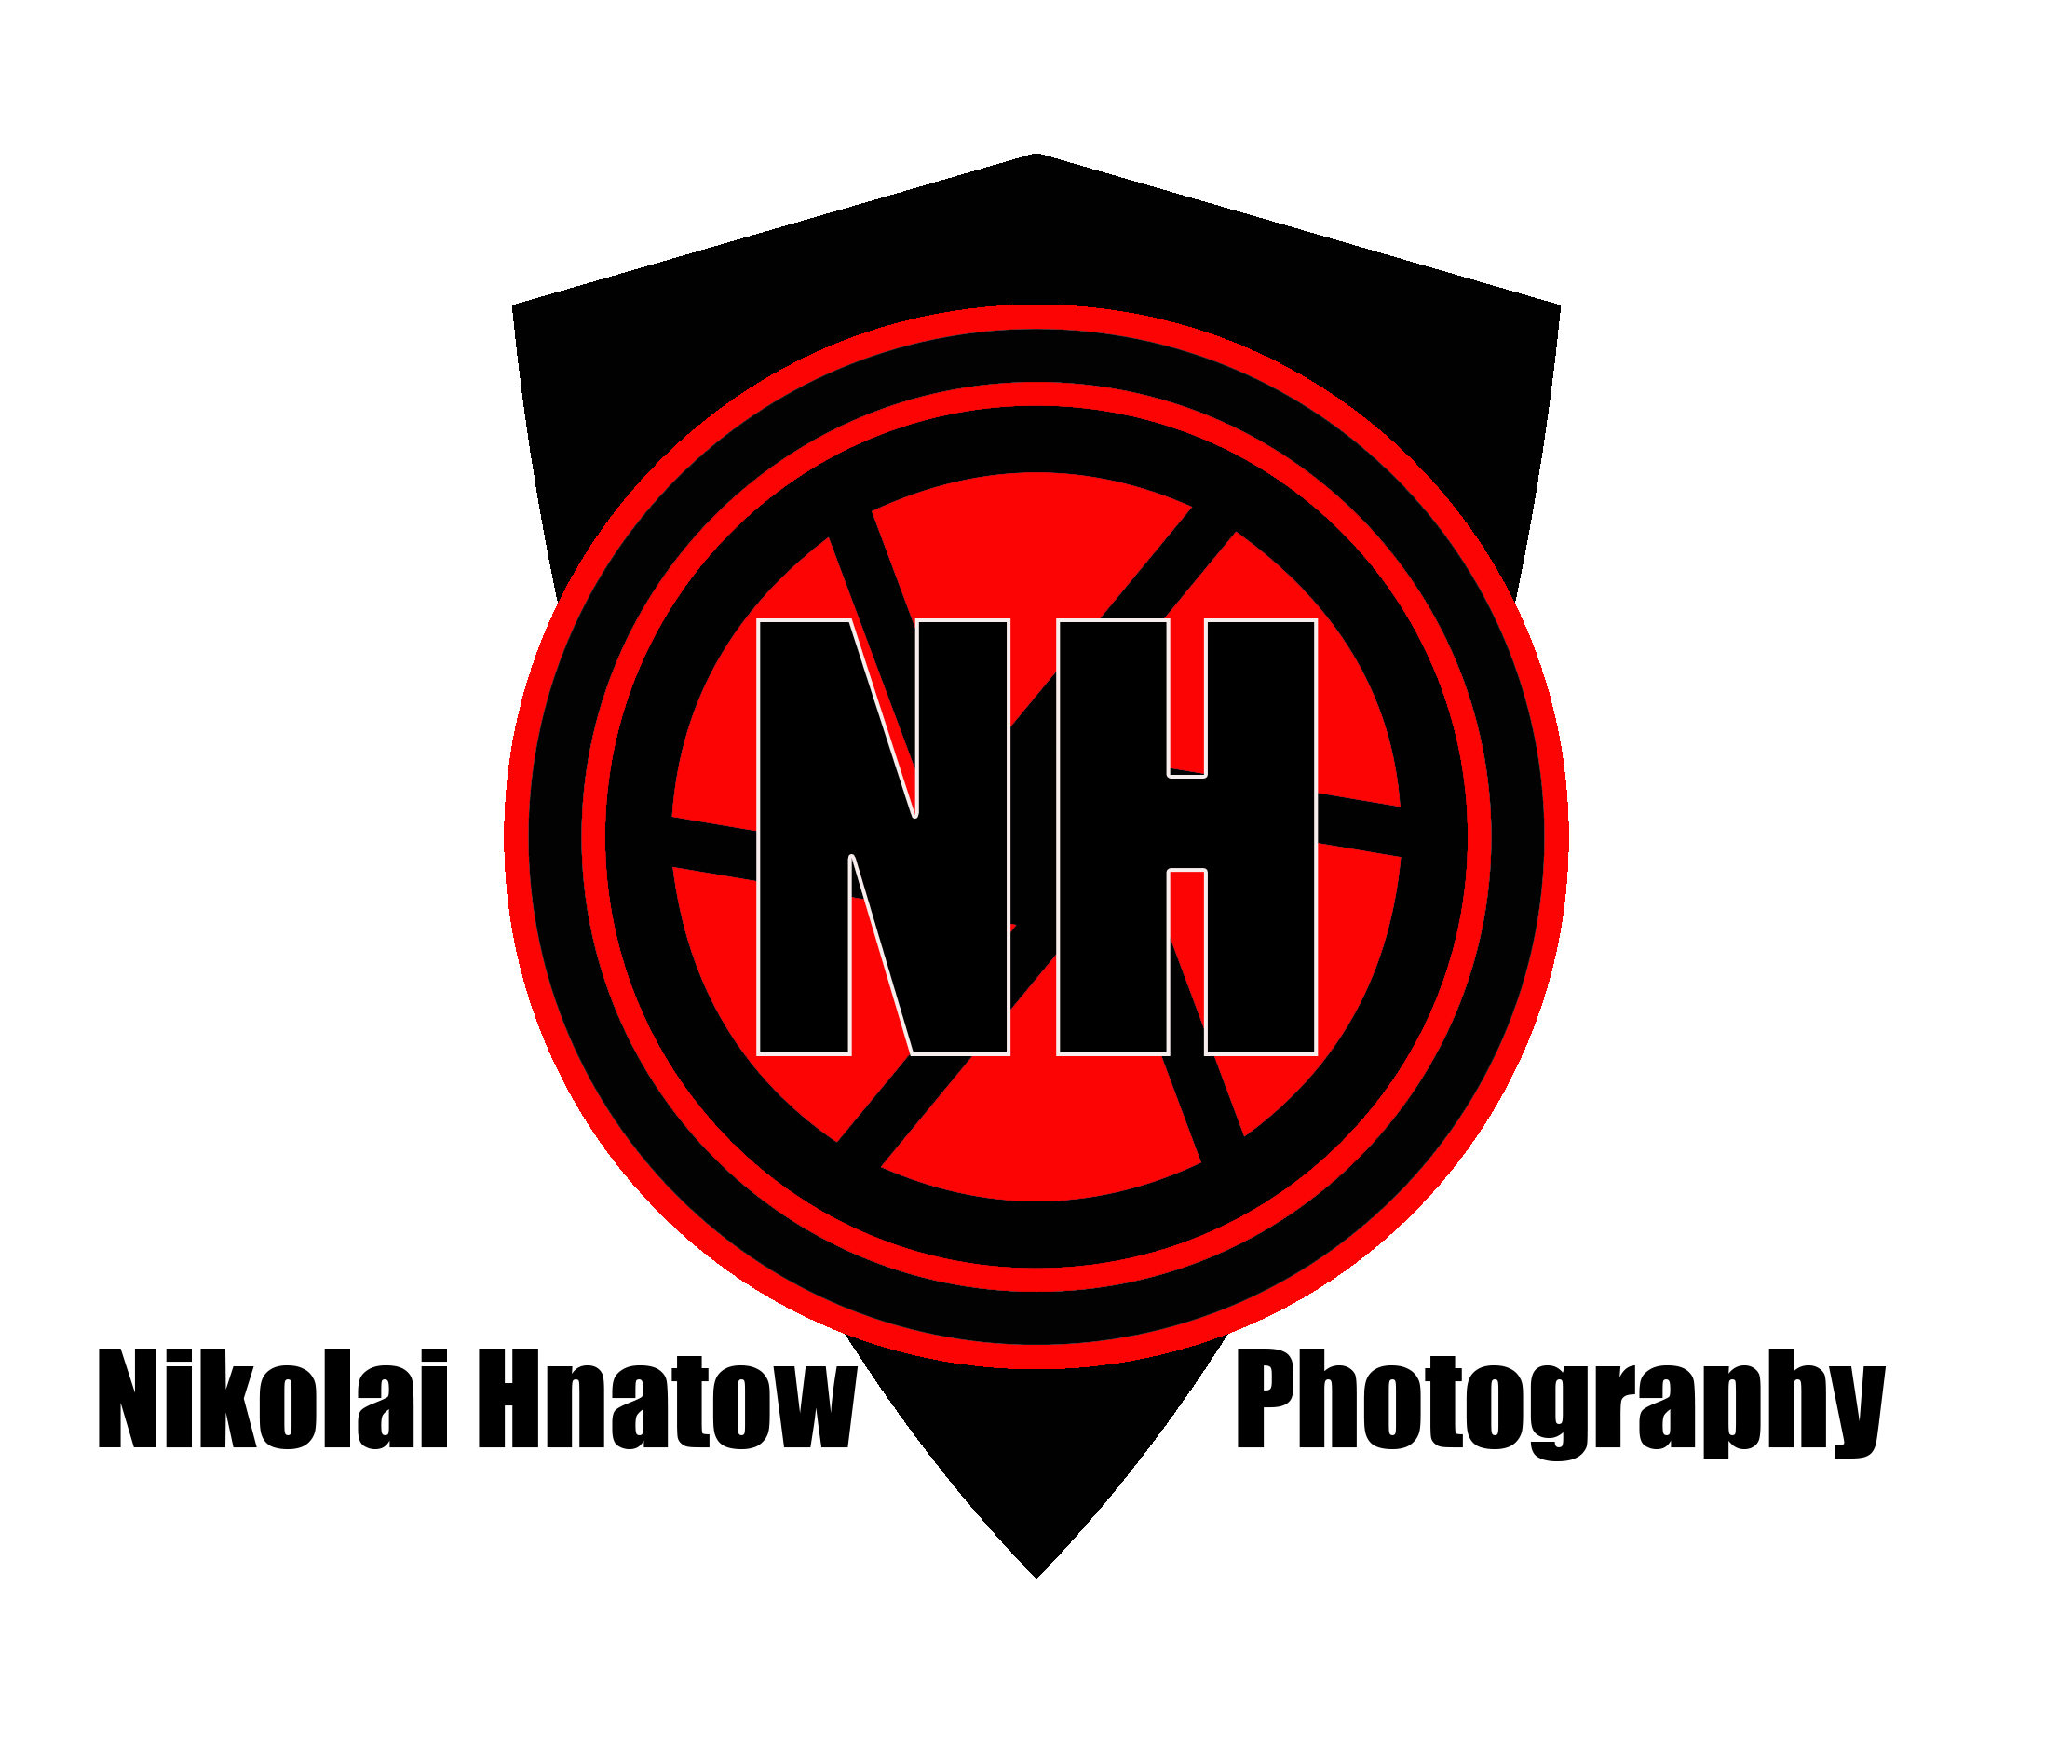 camera-lens-logo.png